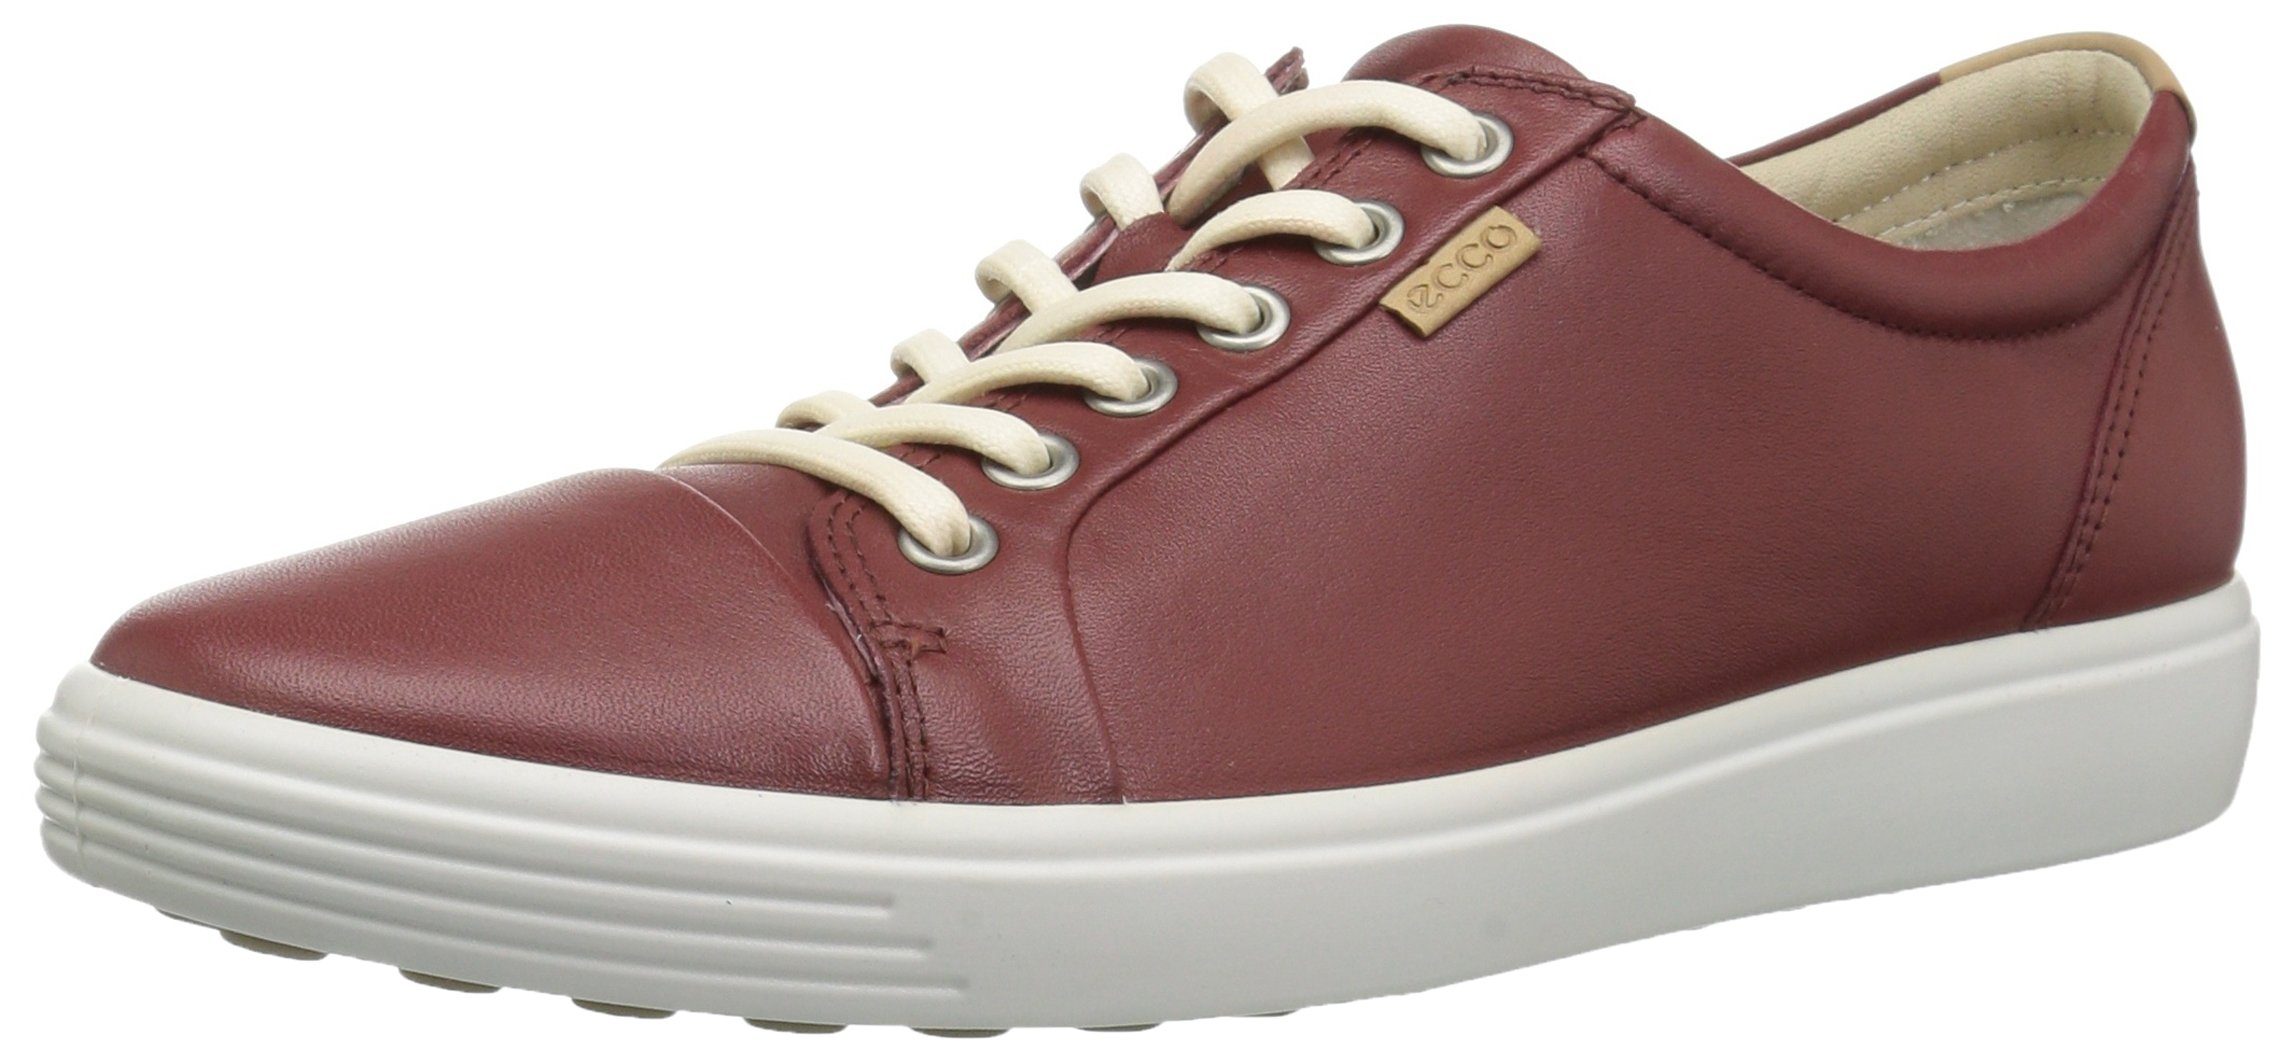 ECCO Soft 7 女士运动鞋